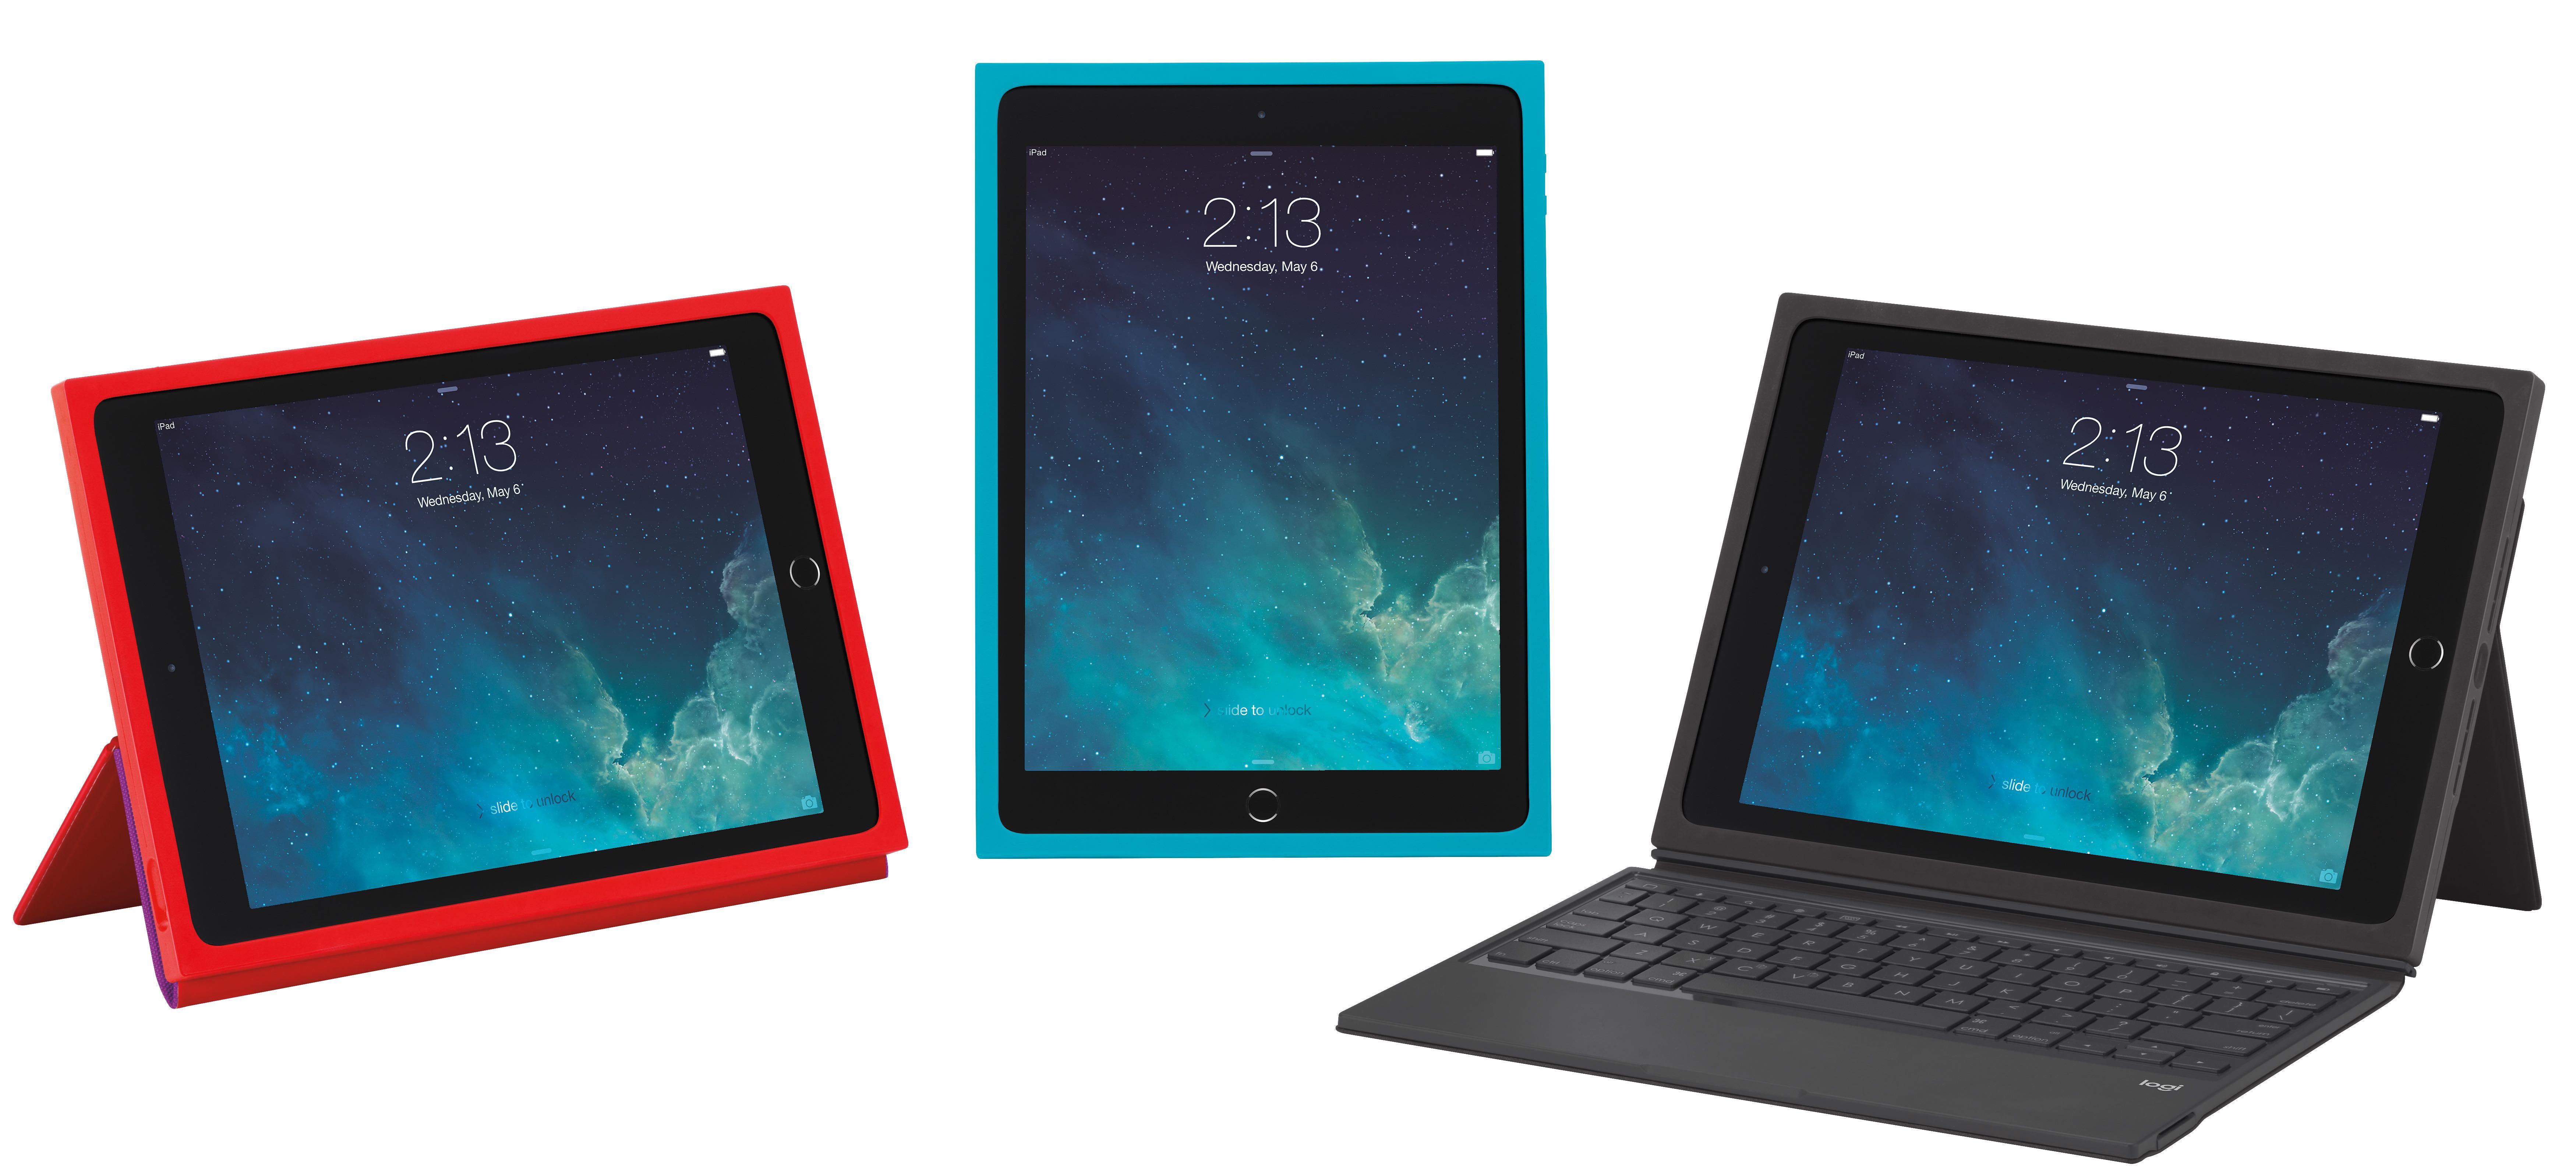 Logitech BLOK cases for iPad